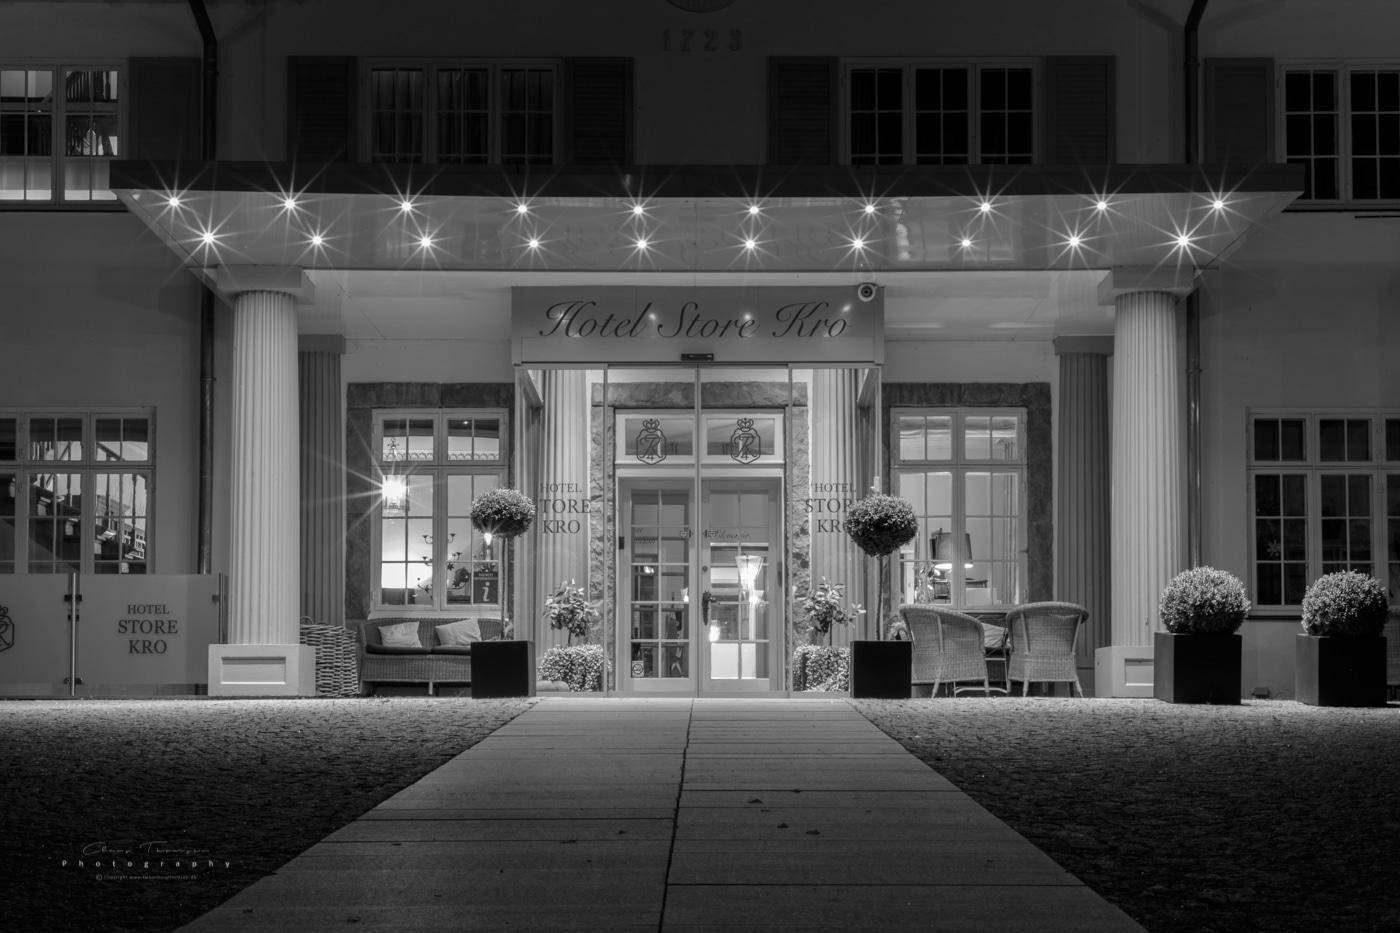 Hotel Store Kro